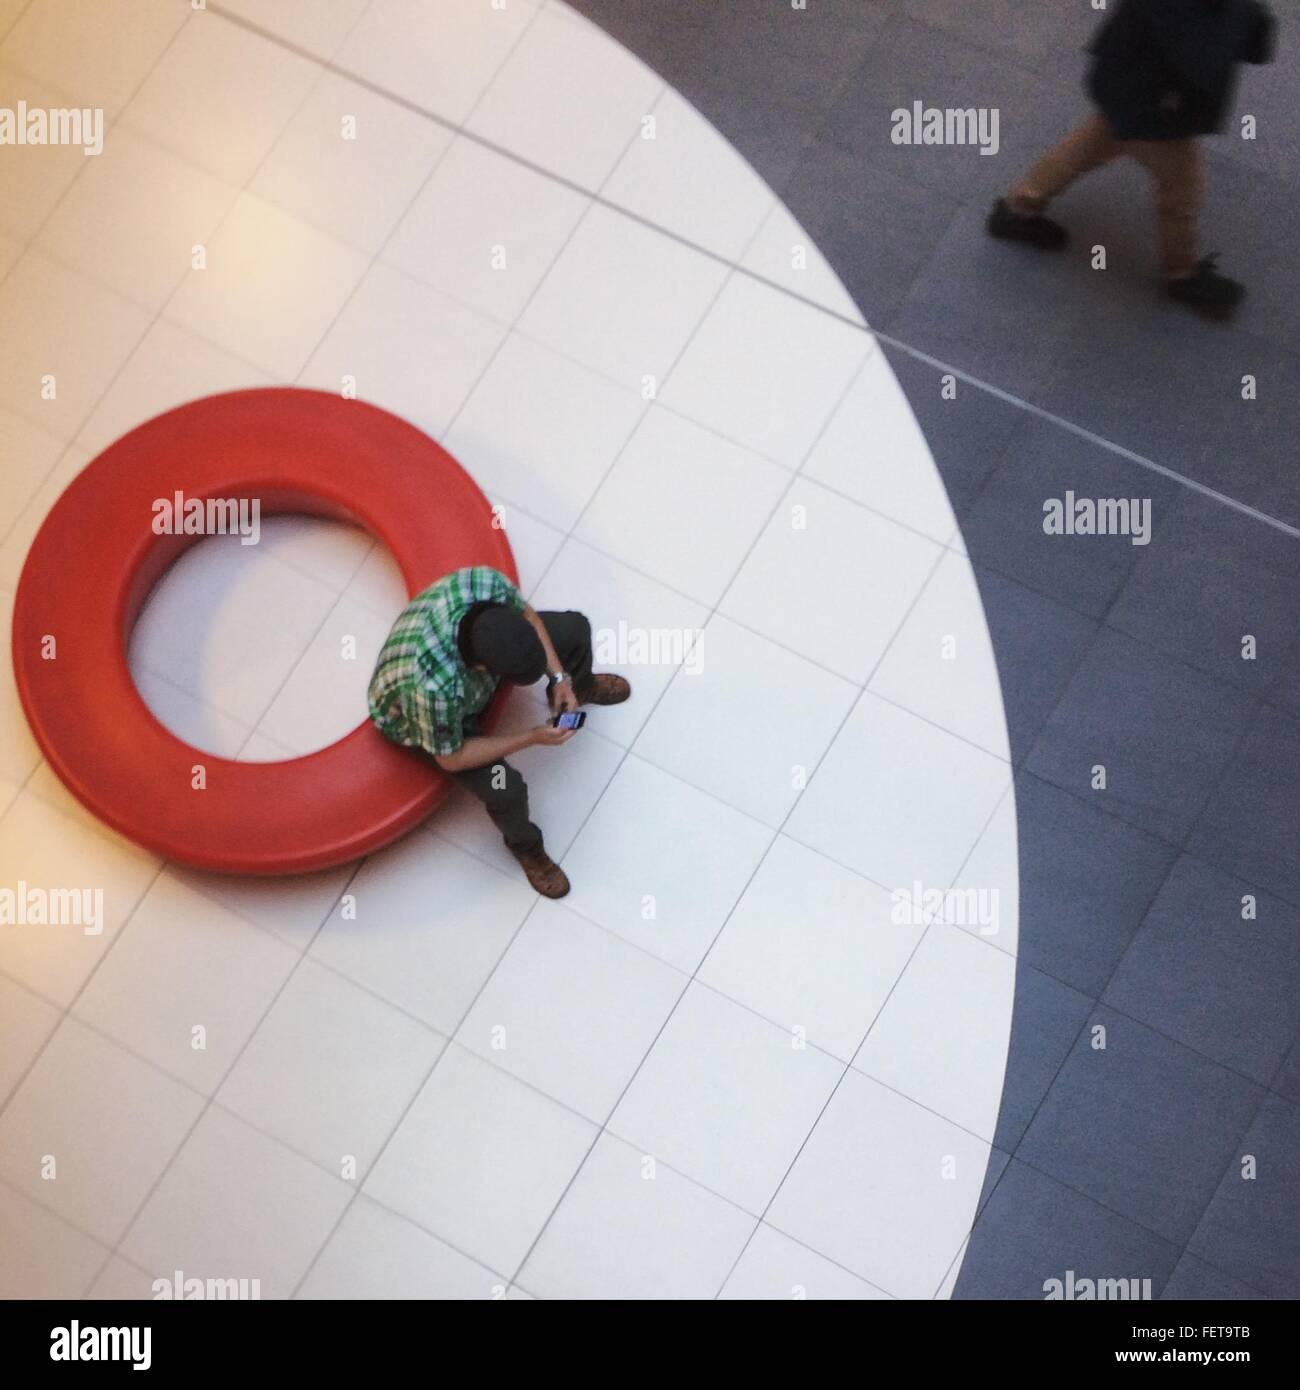 High Angle View Of Mann mit Handy In Lobby Stockbild